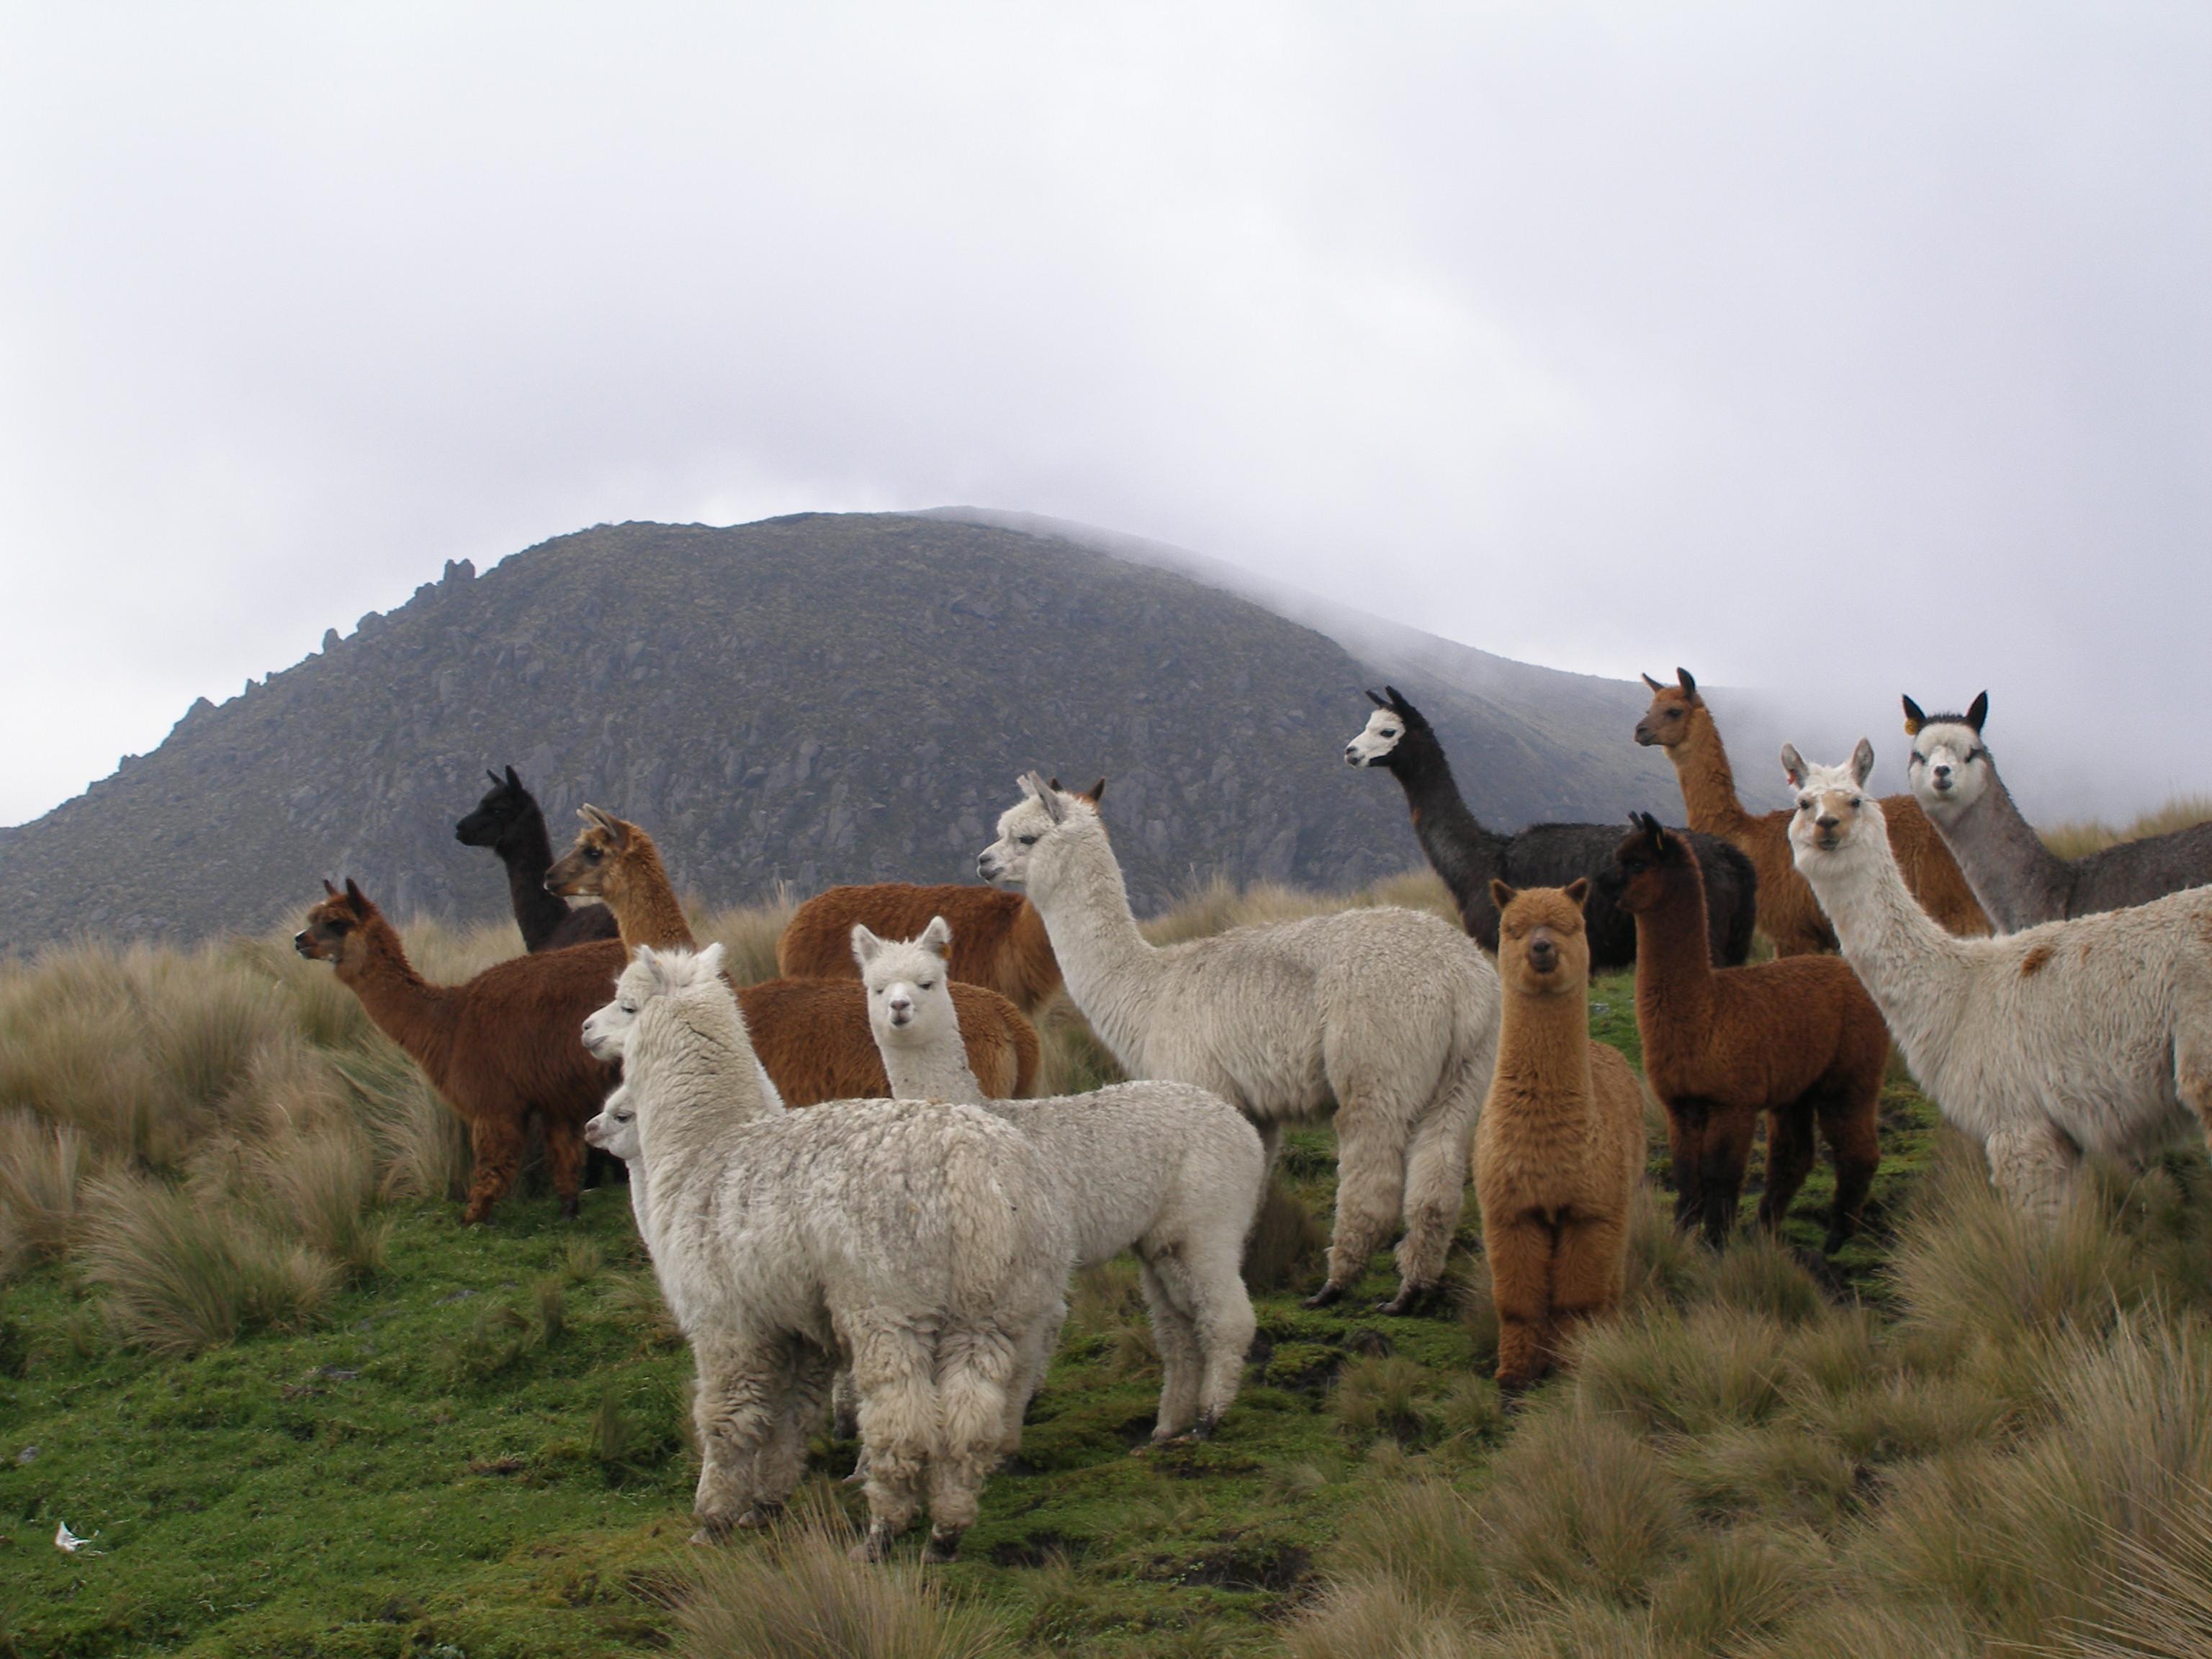 A flock of Alpacas